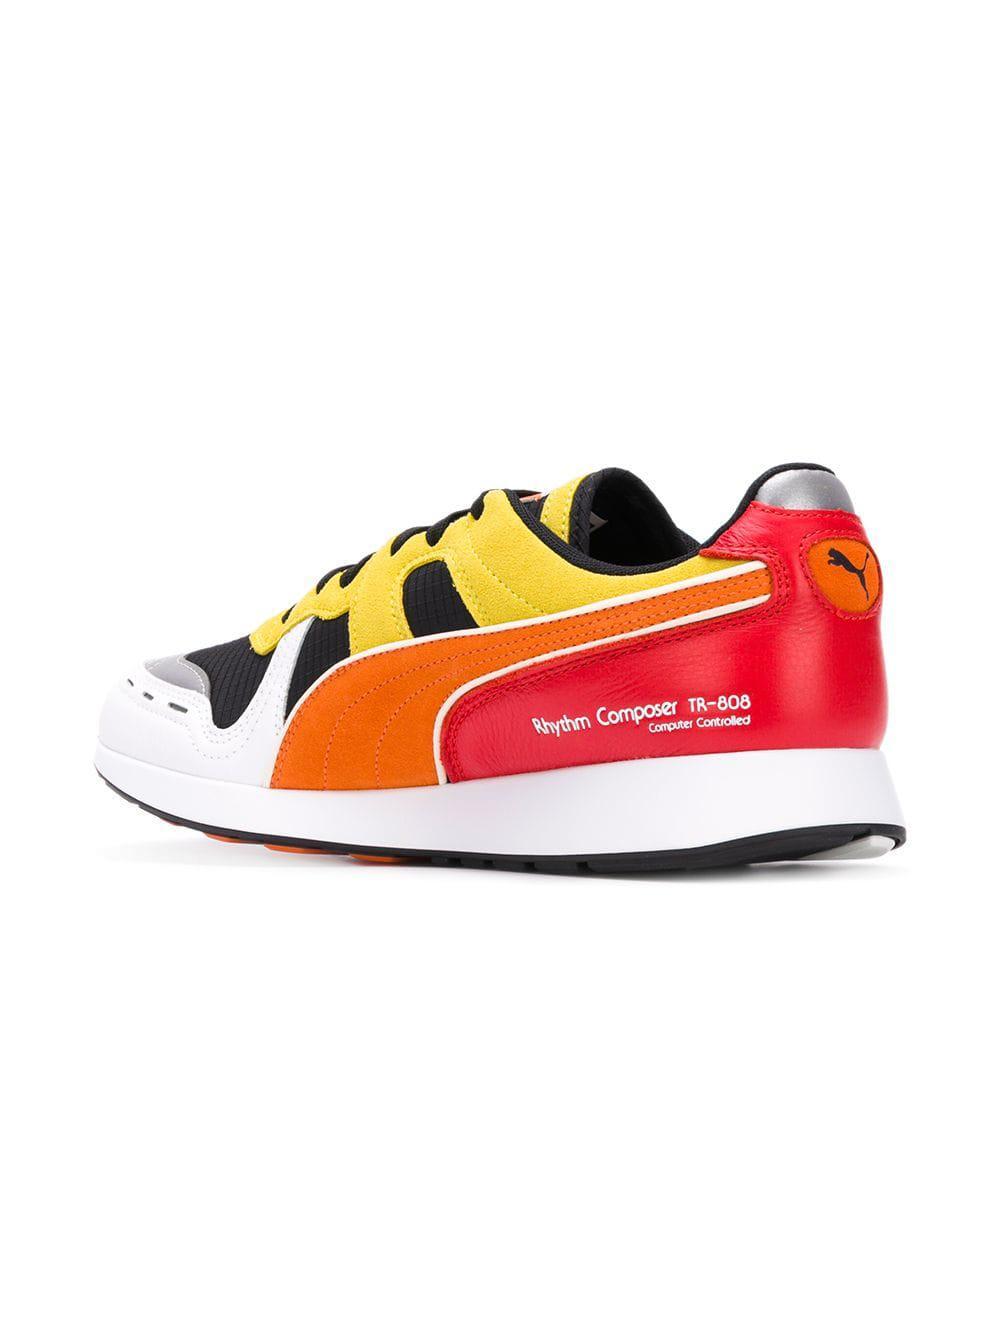 4f6eff7e6591f2 Puma Rs-100 Sneakers in Black for Men - Lyst